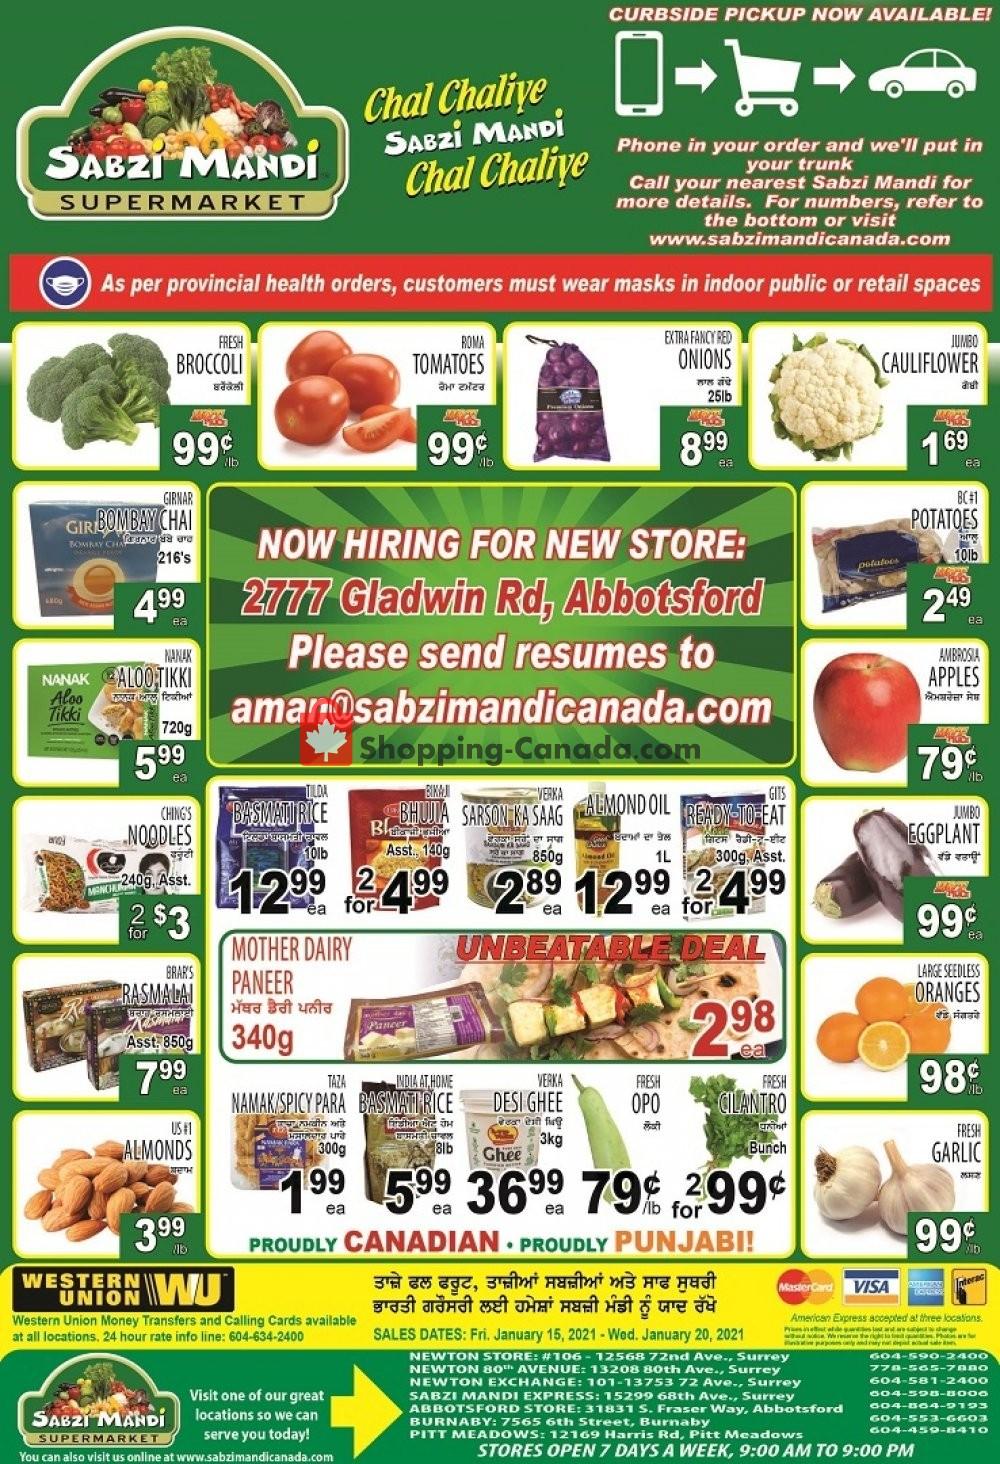 Flyer Sabzi Mandi Supermarket Canada - from Friday January 15, 2021 to Wednesday January 20, 2021